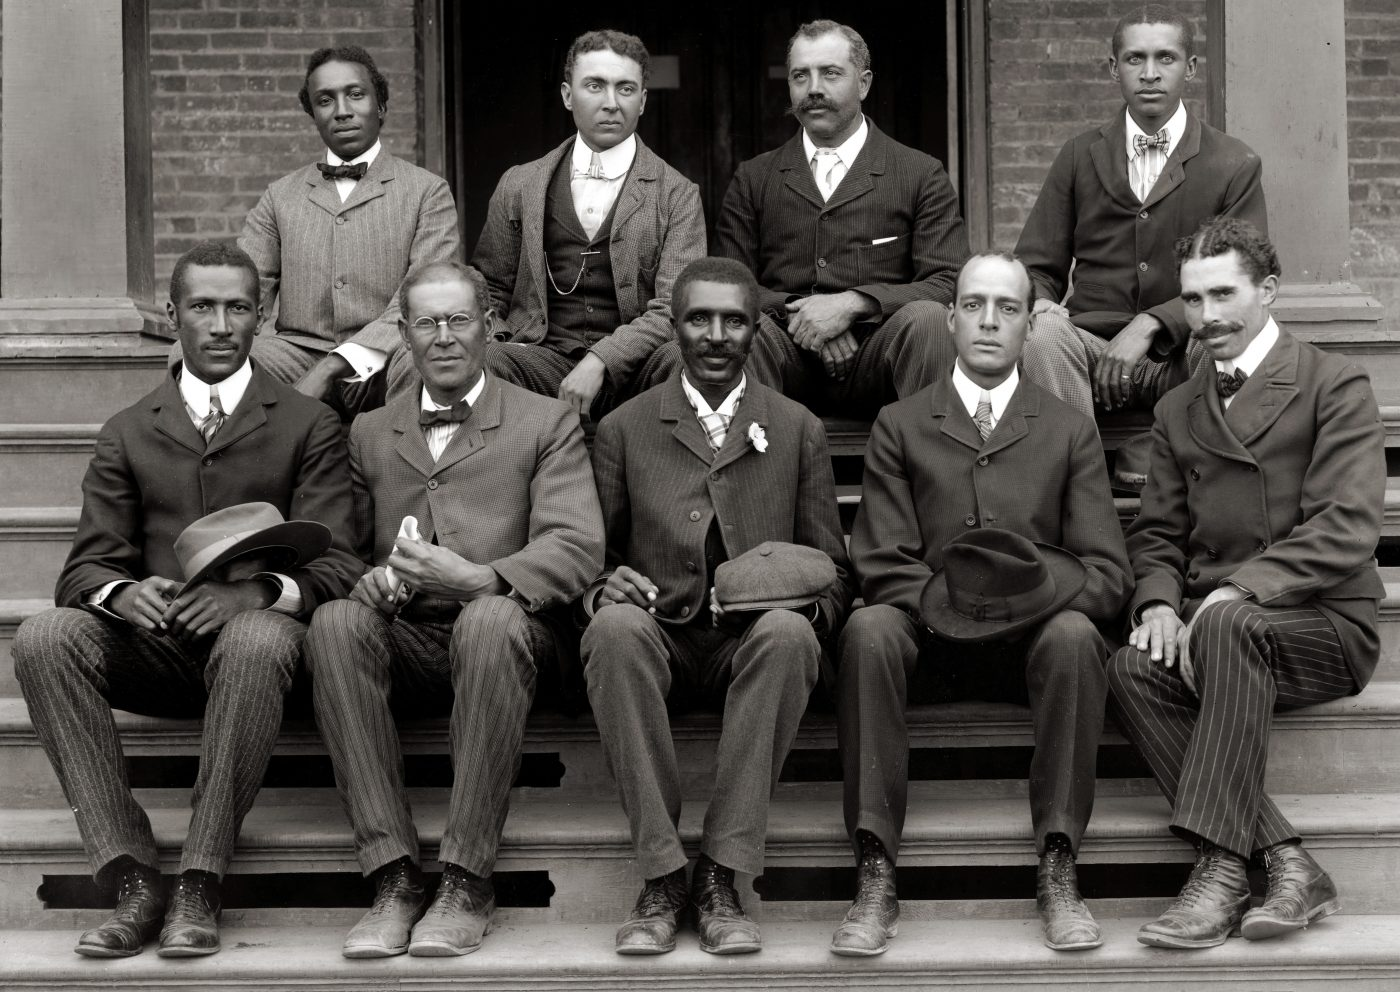 George Washington Carver at Tuskegee University